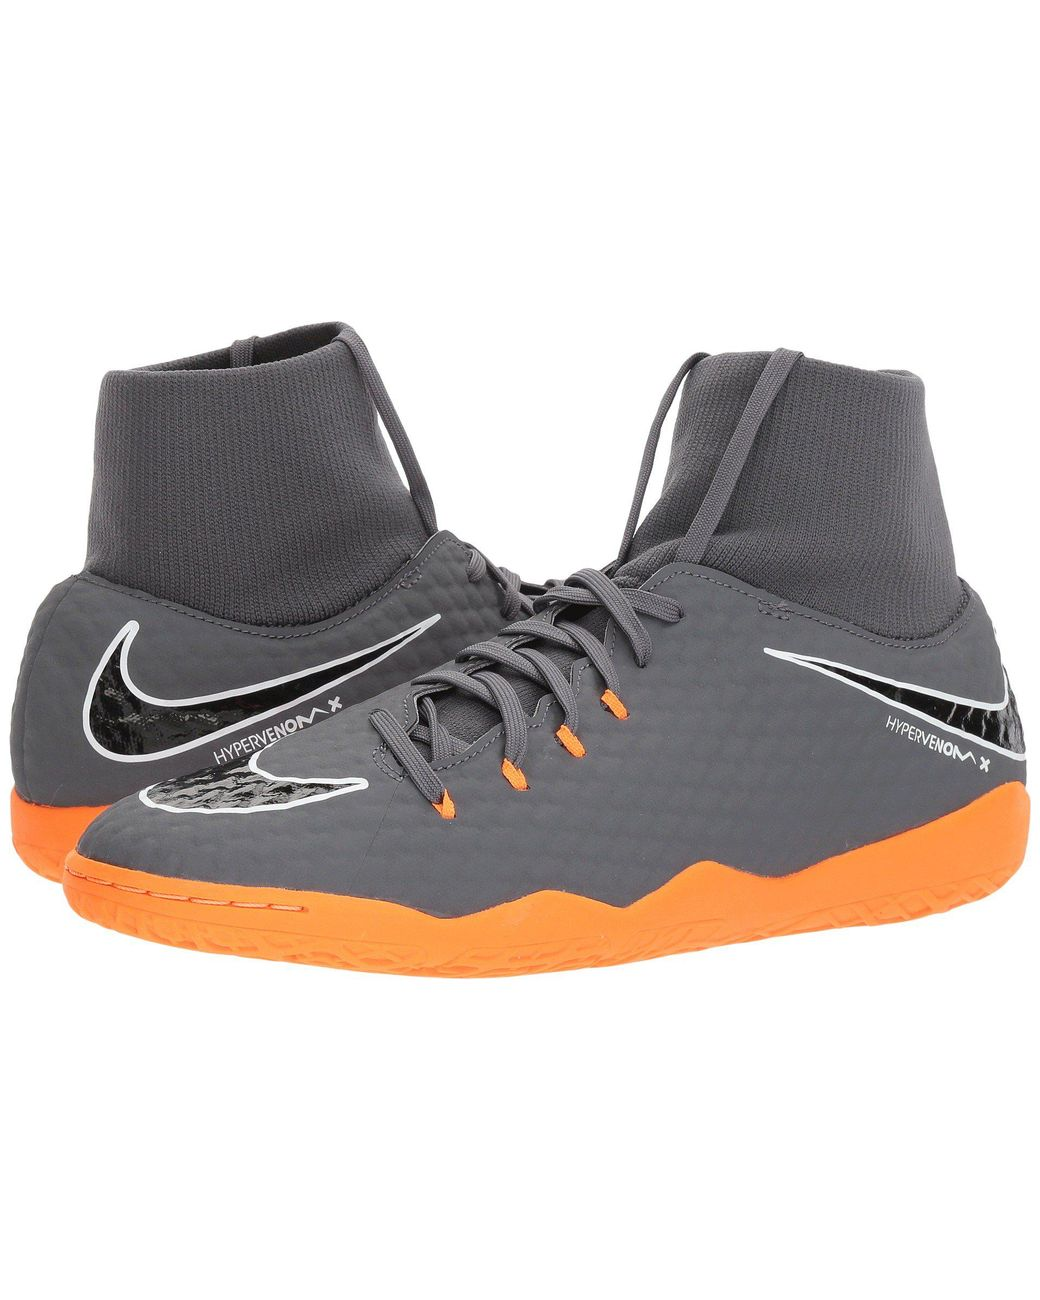 37781c4201 Lyst - Nike Hypervenom Phantomx 3 Academy Dynamic Fit Ic in Gray for ...